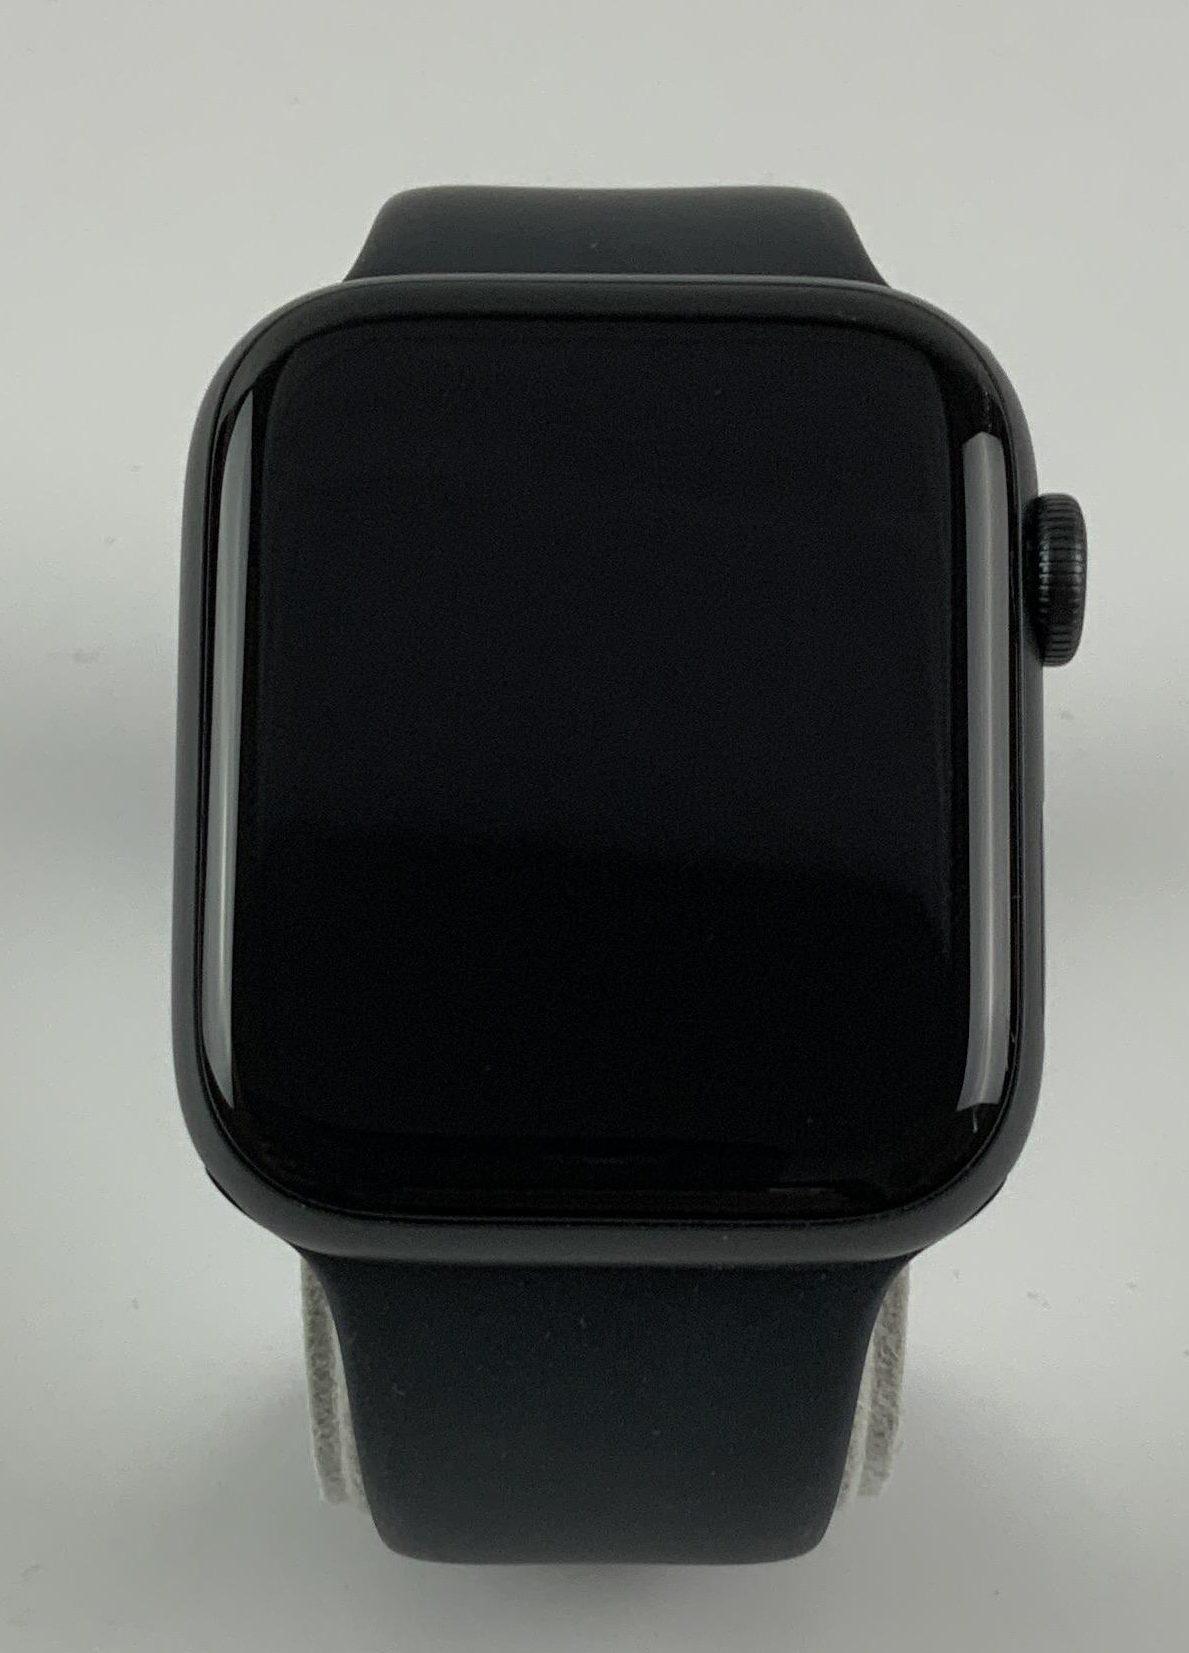 Watch Series 5 Aluminum Cellular (44mm), Space Gray, imagen 1